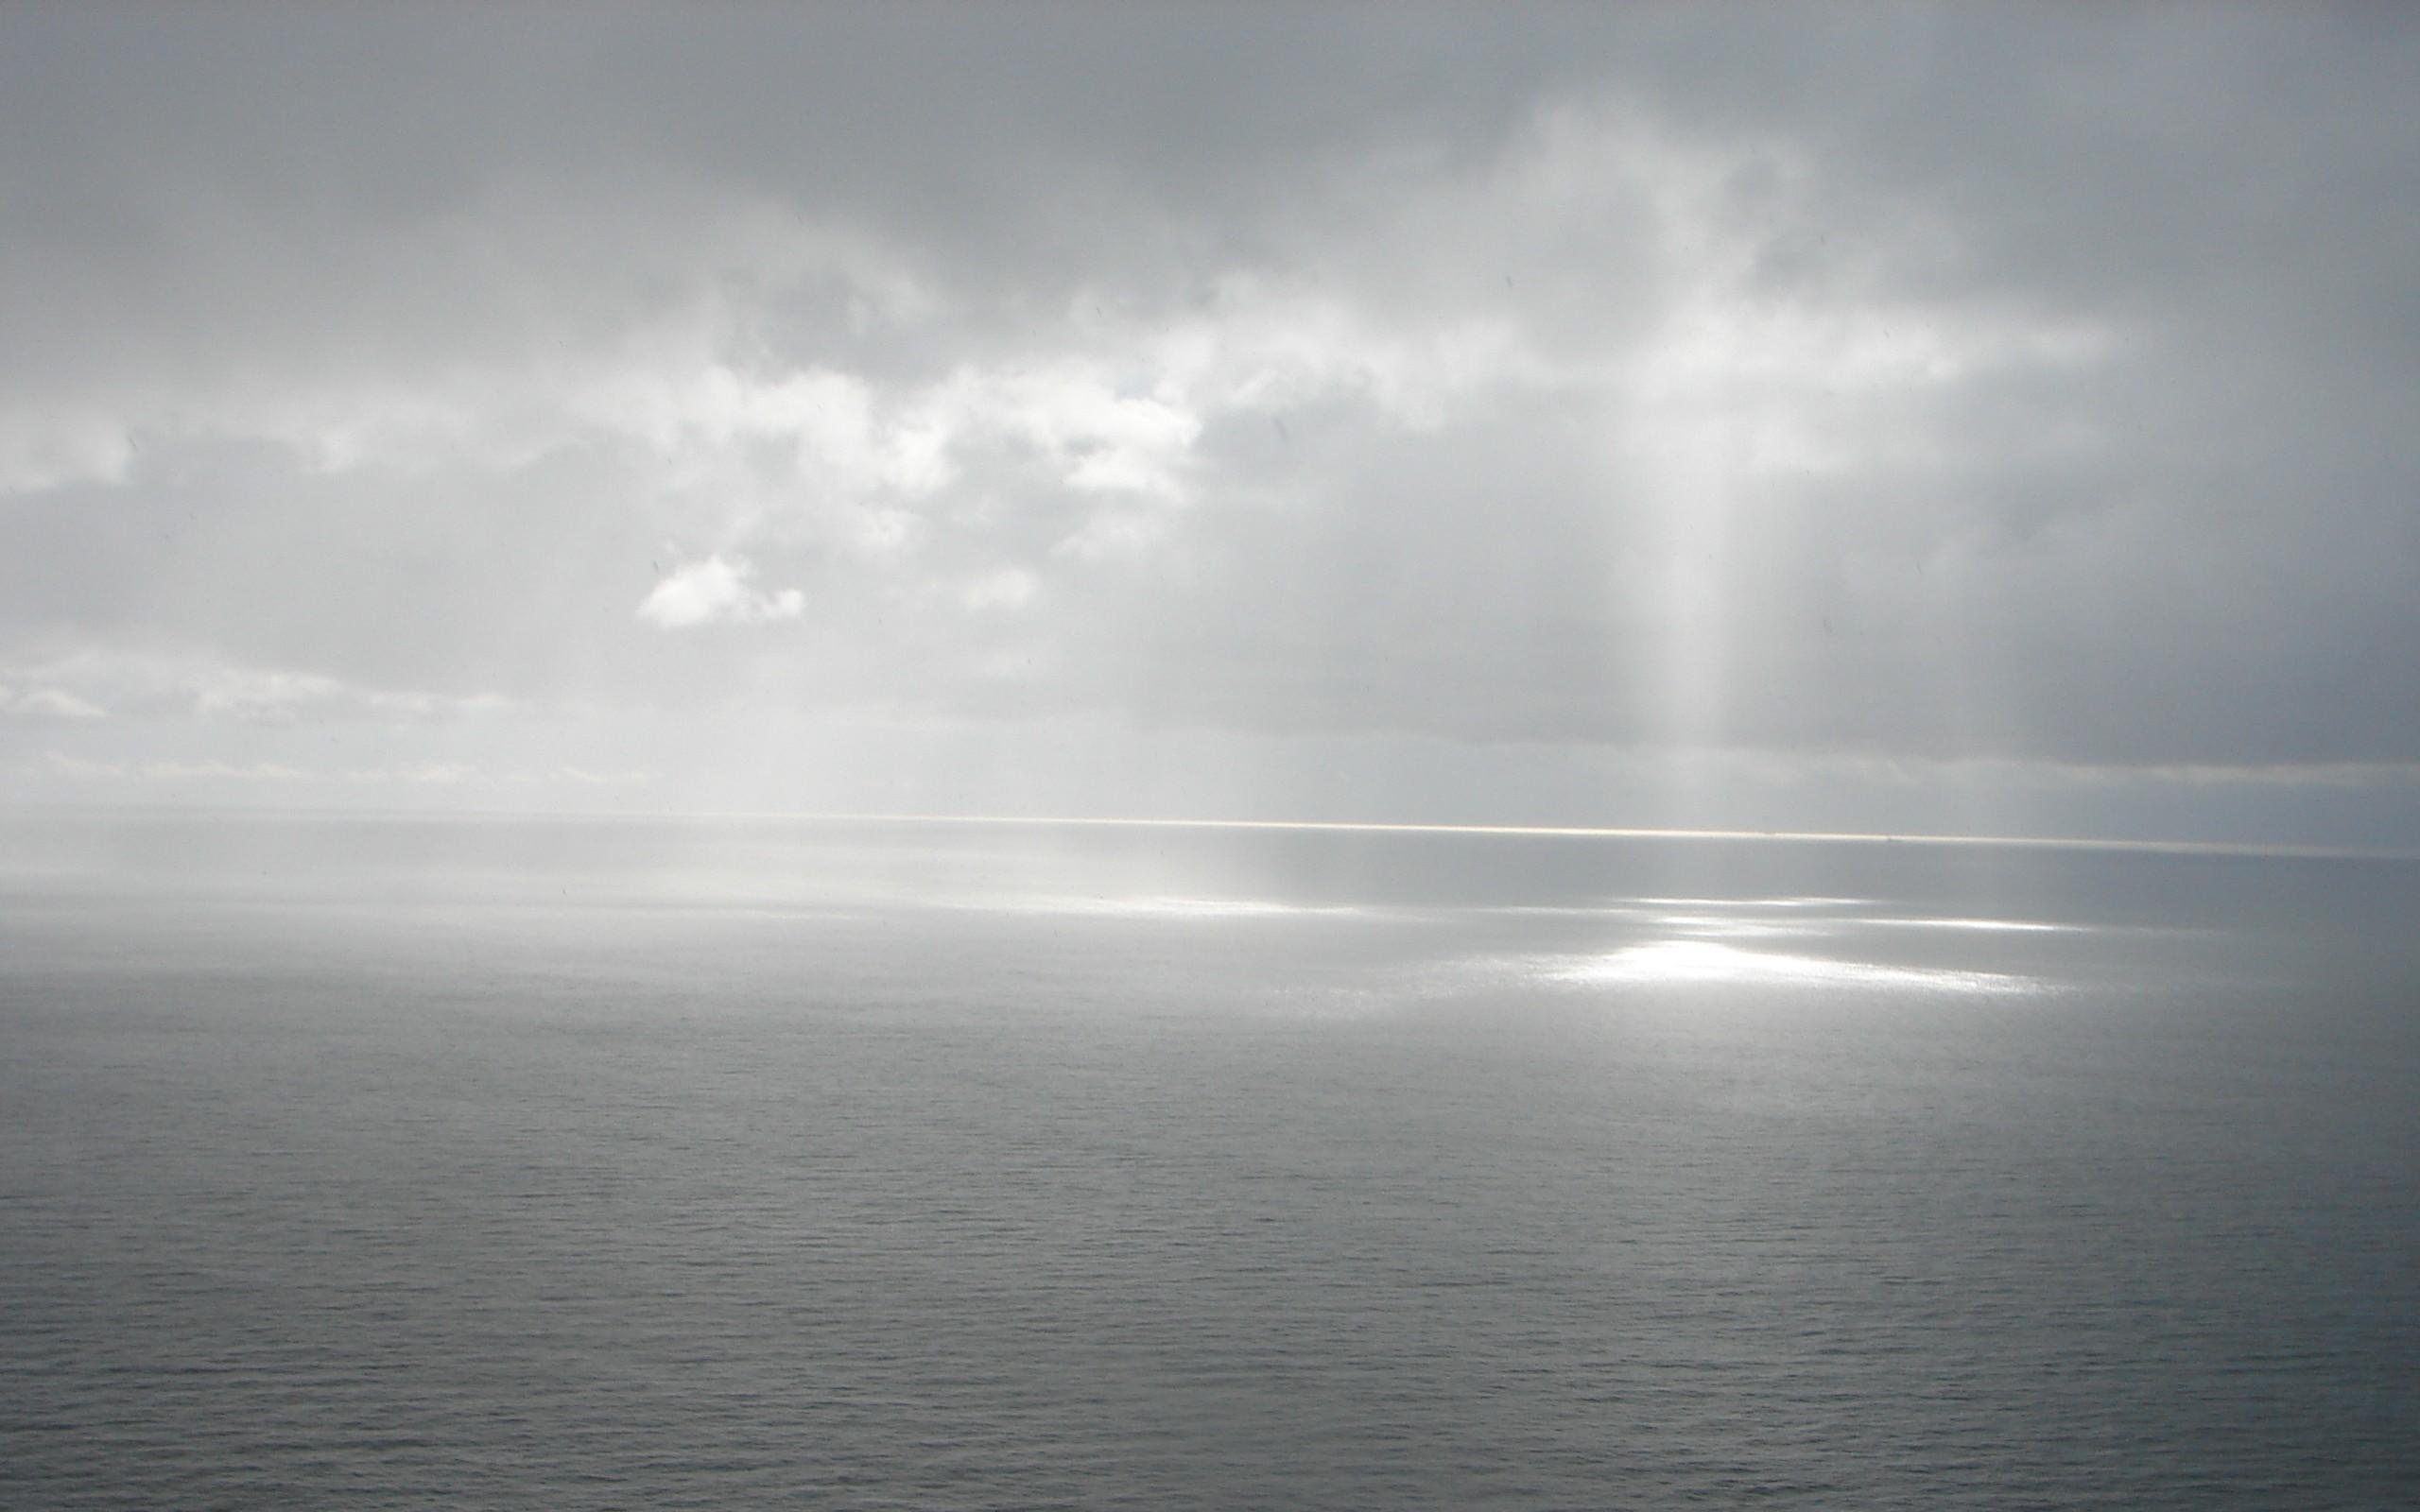 Cloudy Ocean Wallpapers, Cloudy Ocean Myspace Backgrounds, Cloudy .